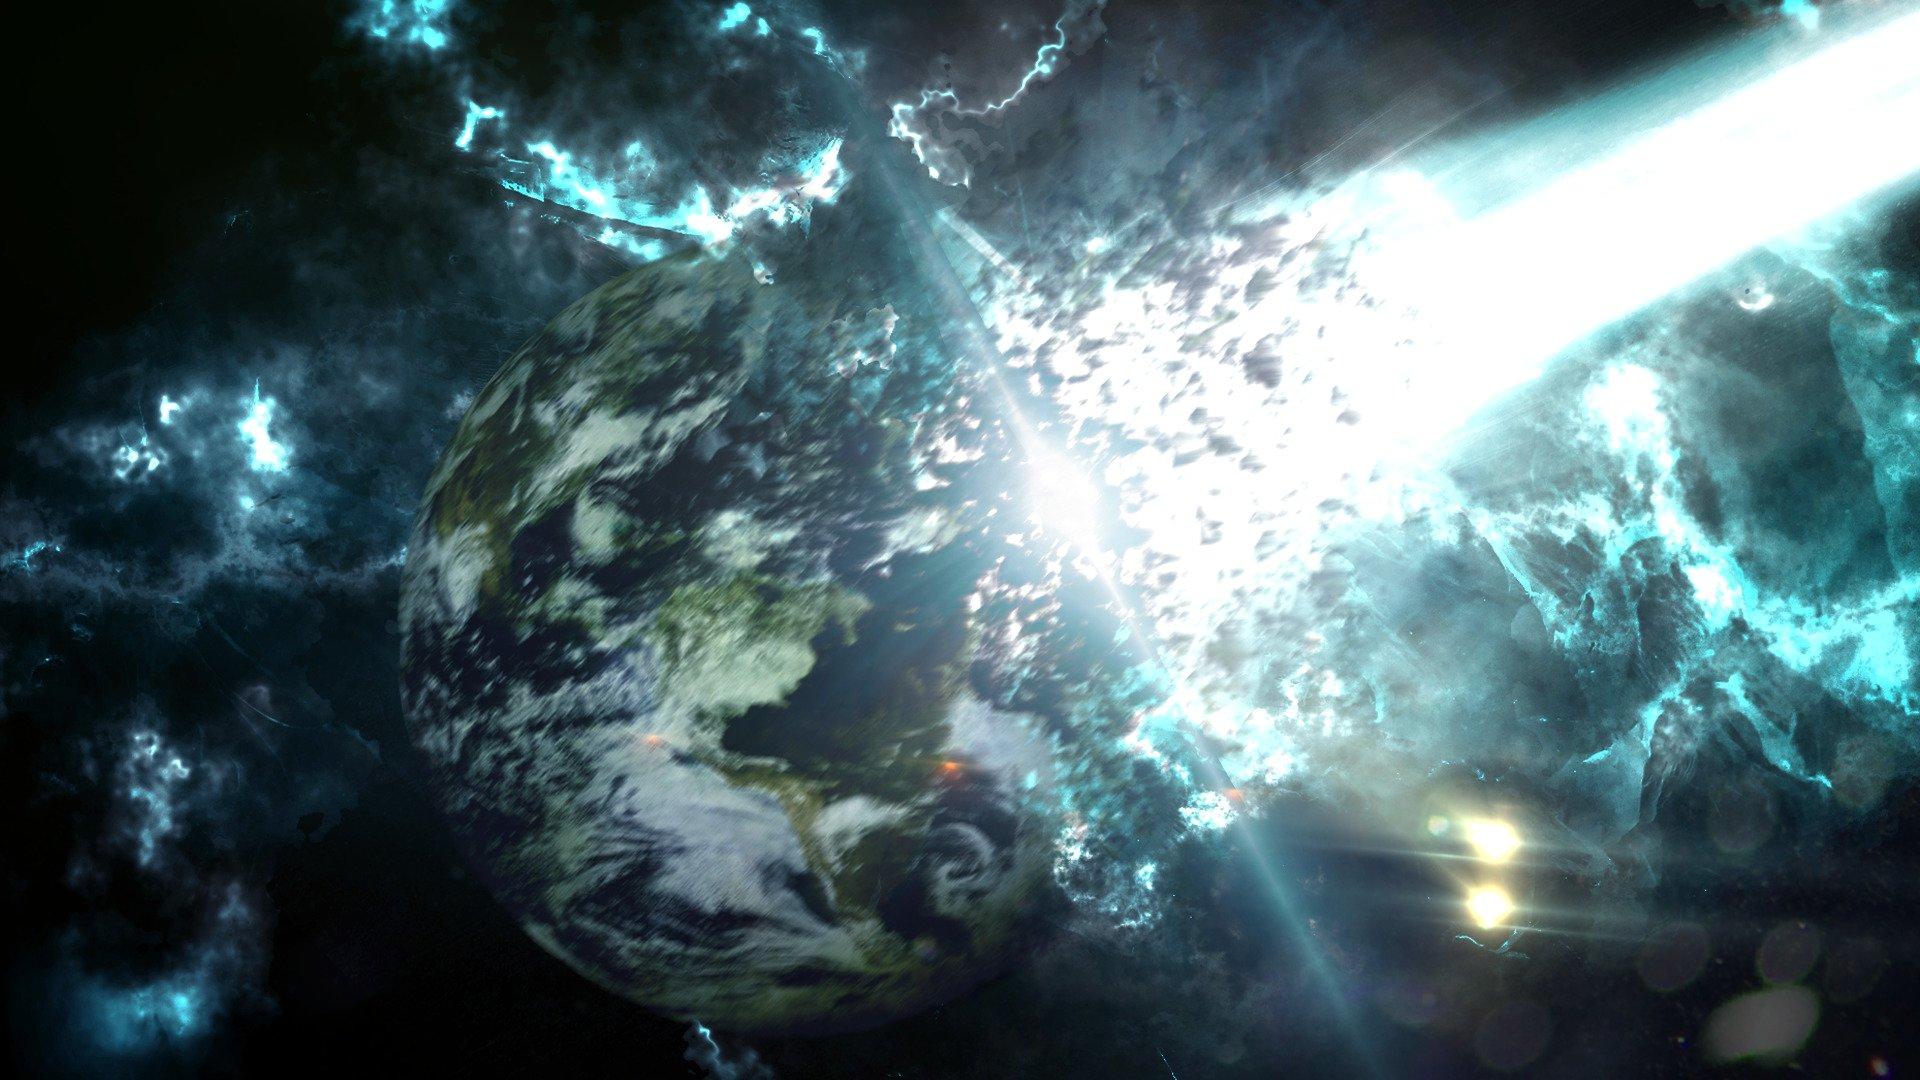 Earth Digital Art Hd Wallpaper: Space, Meteors, Earth, Apocalyptic, Destruction, Science